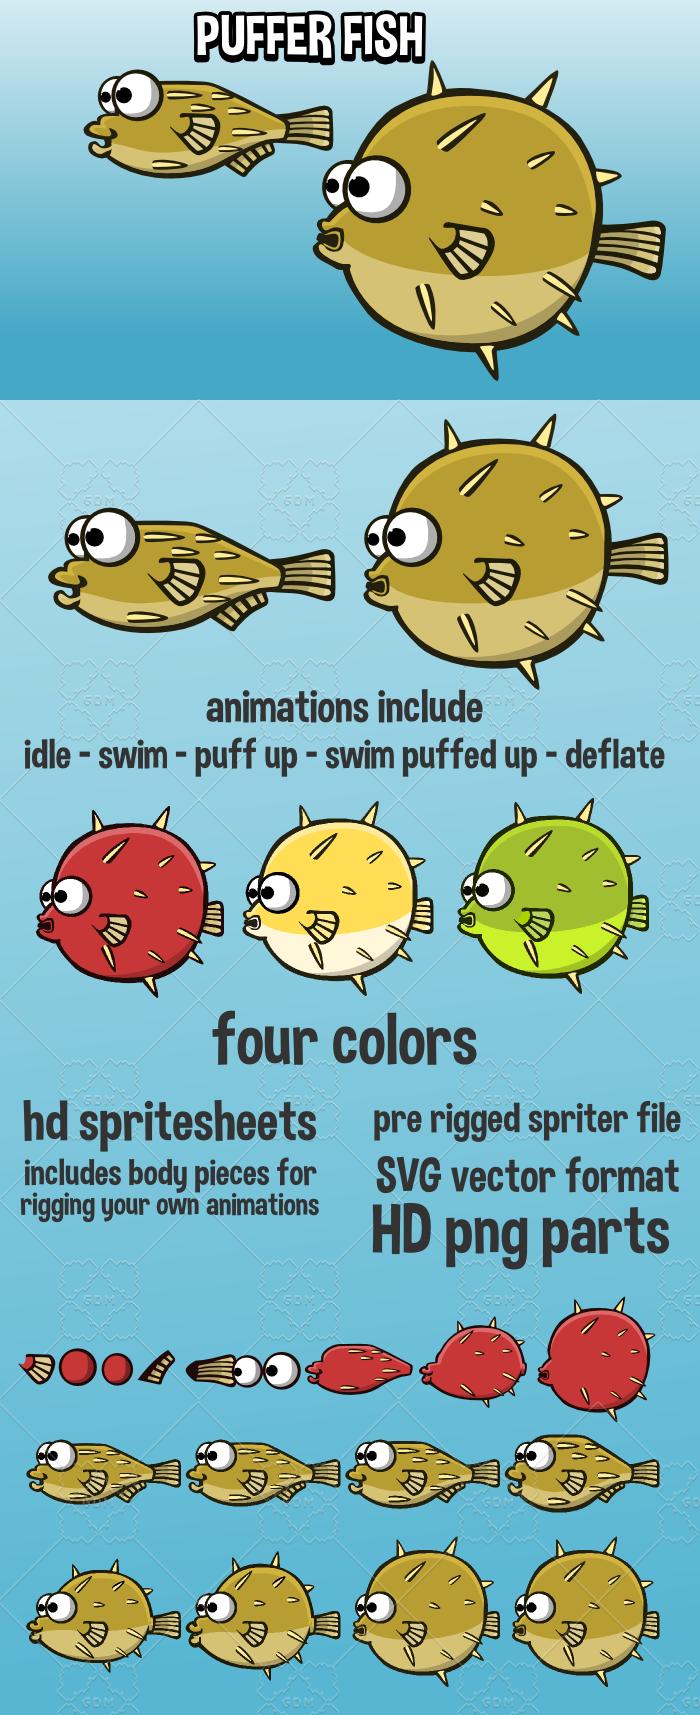 Animated puffer fish